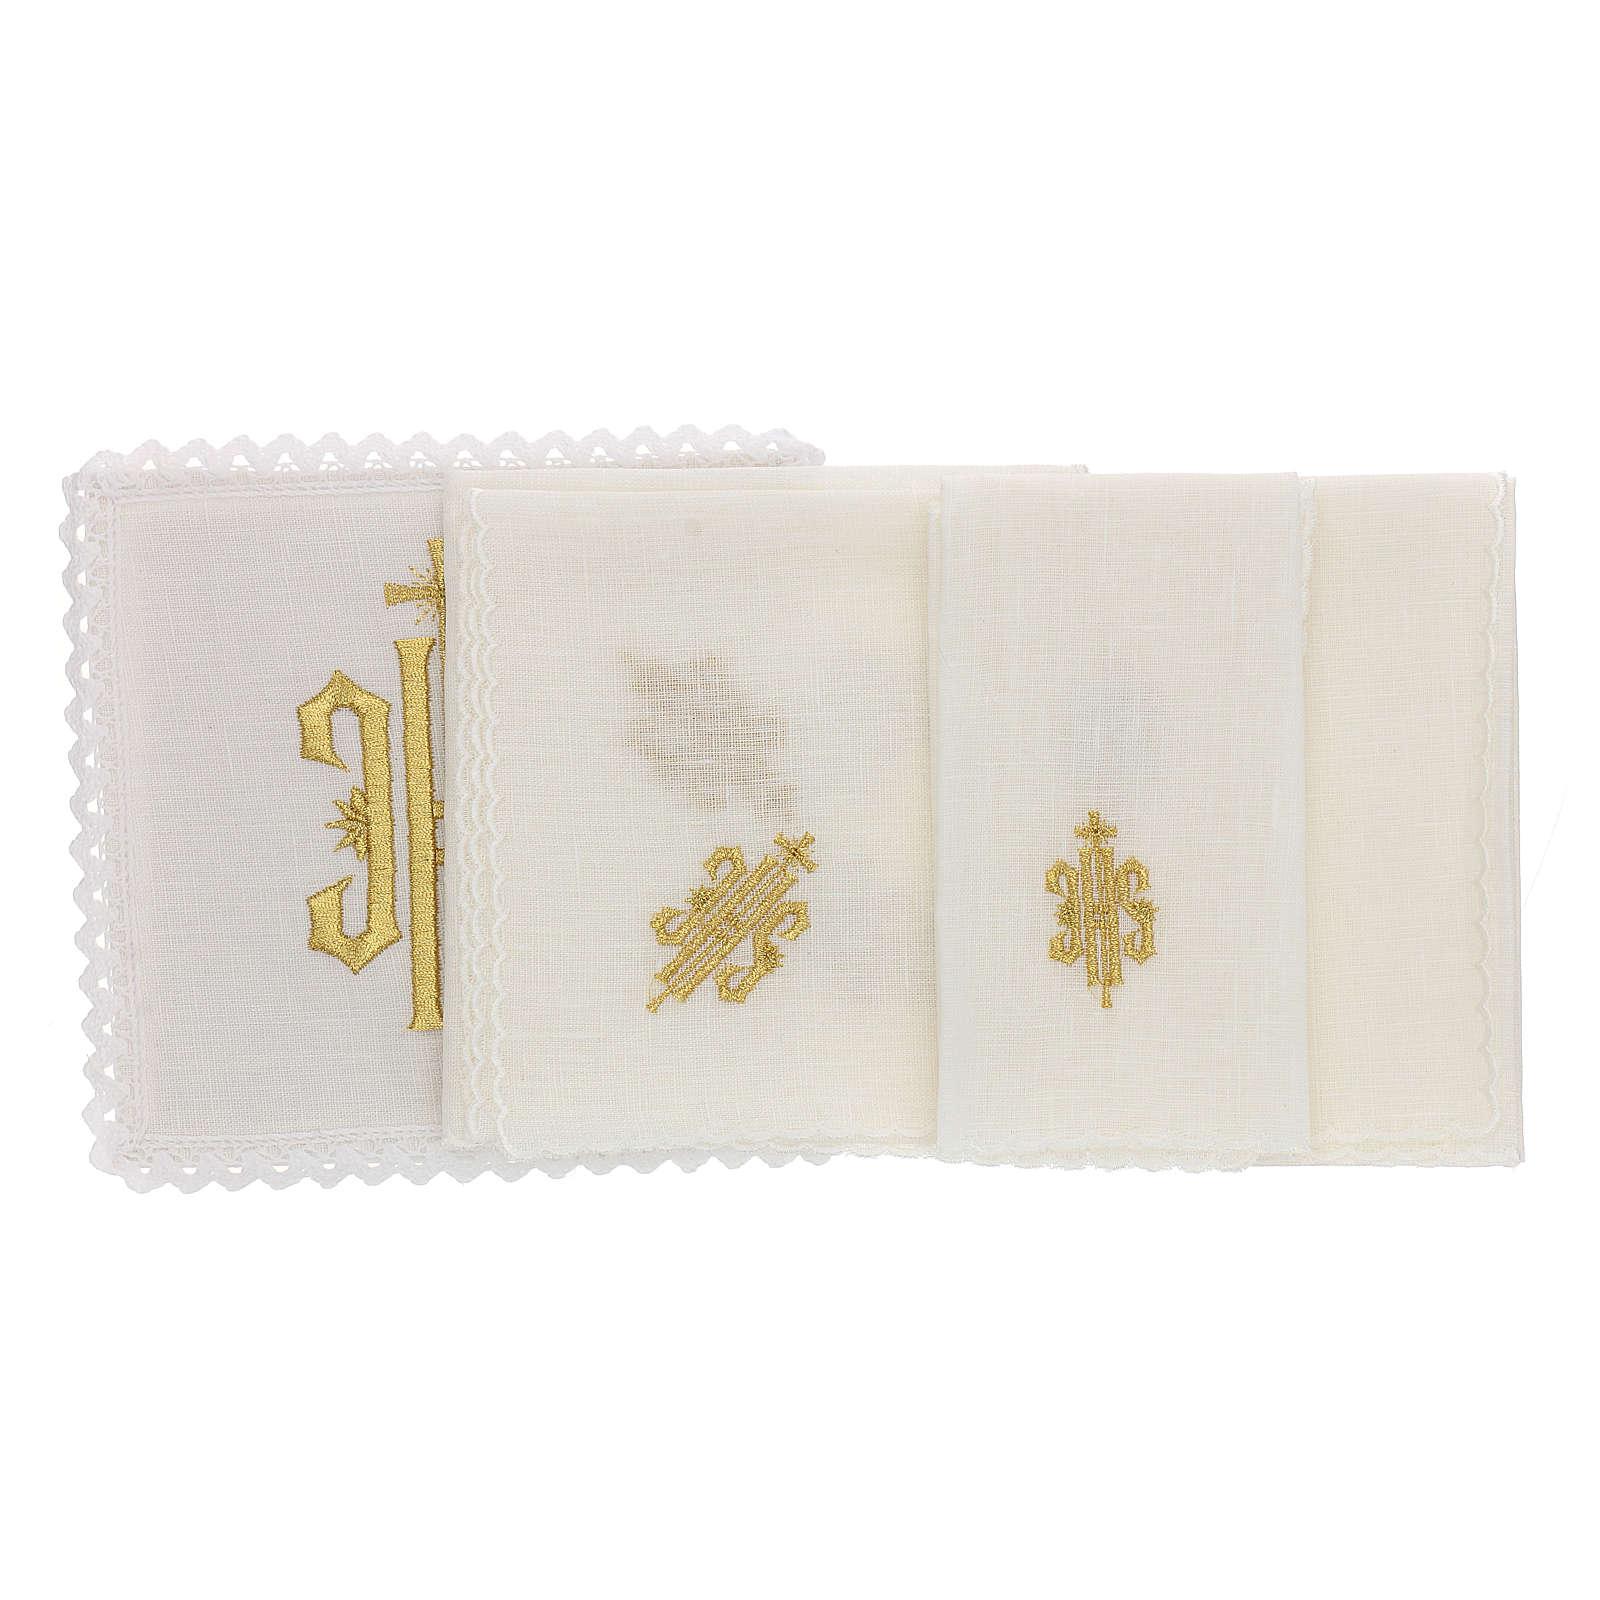 Altar linen JHS symbol, golden embroided 4